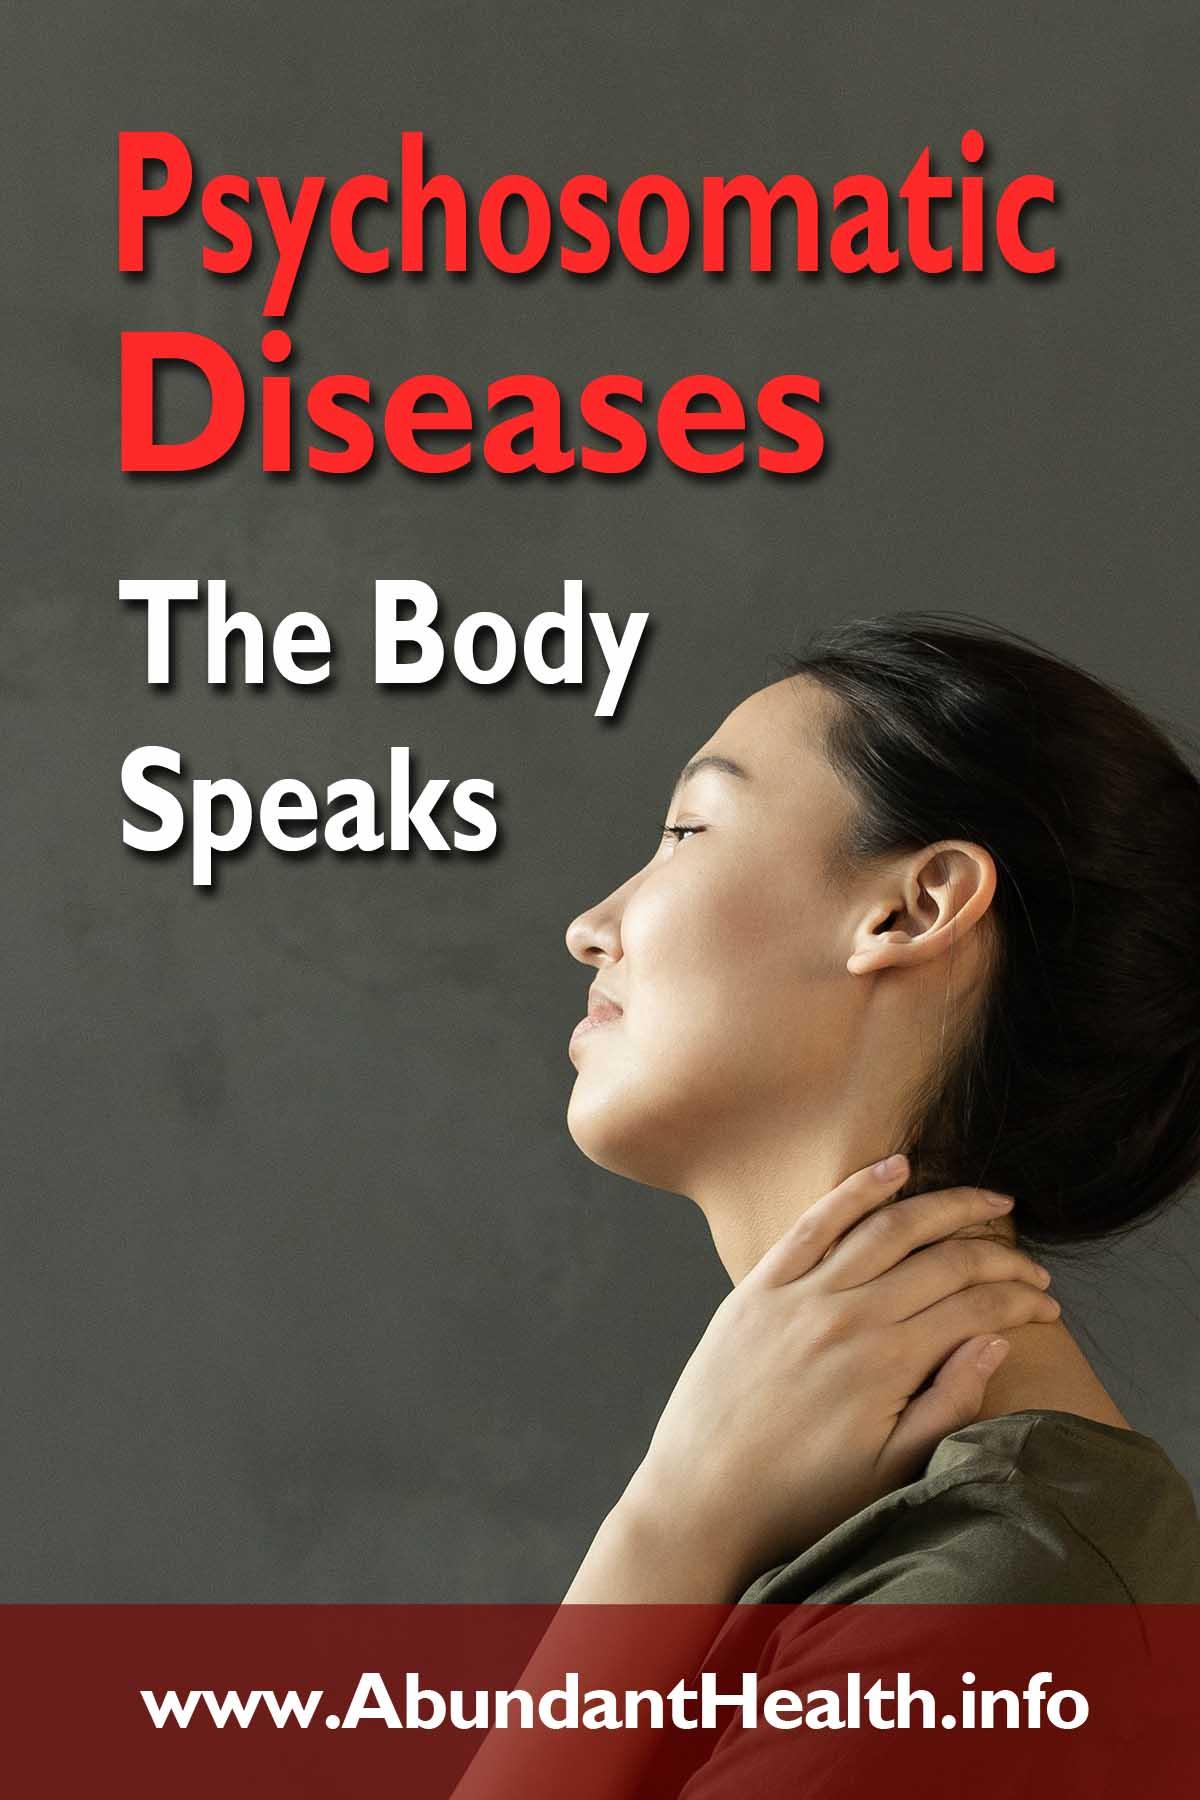 Psychosomatic Diseases - The Body Speaks